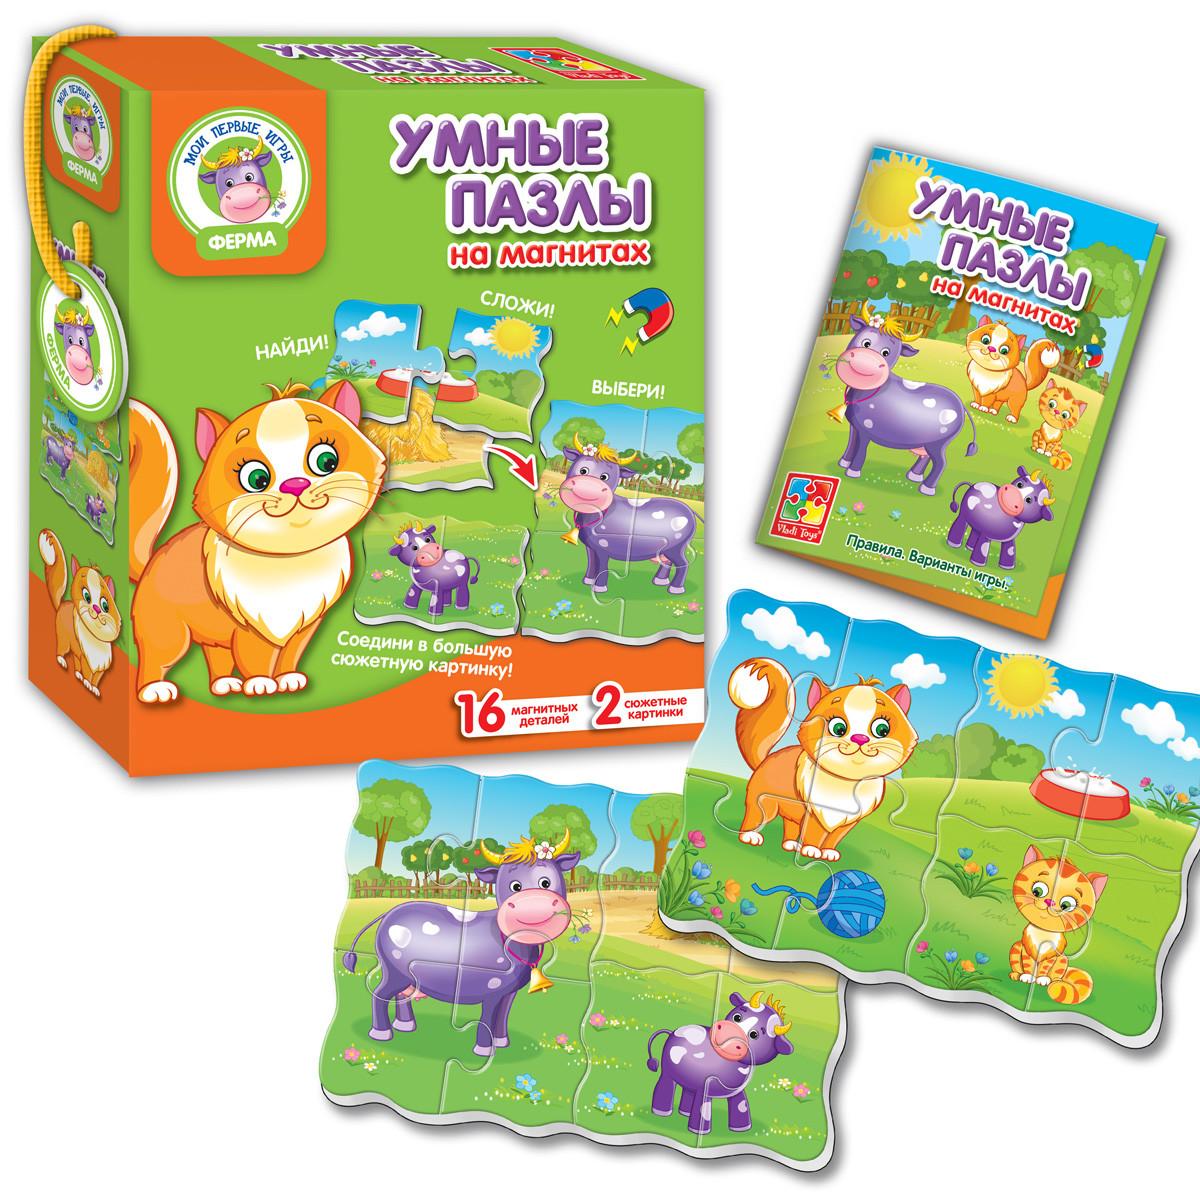 Магнитная игра Vladi Toys Умные пазлы Ферма (Укр) (VT1504-37)